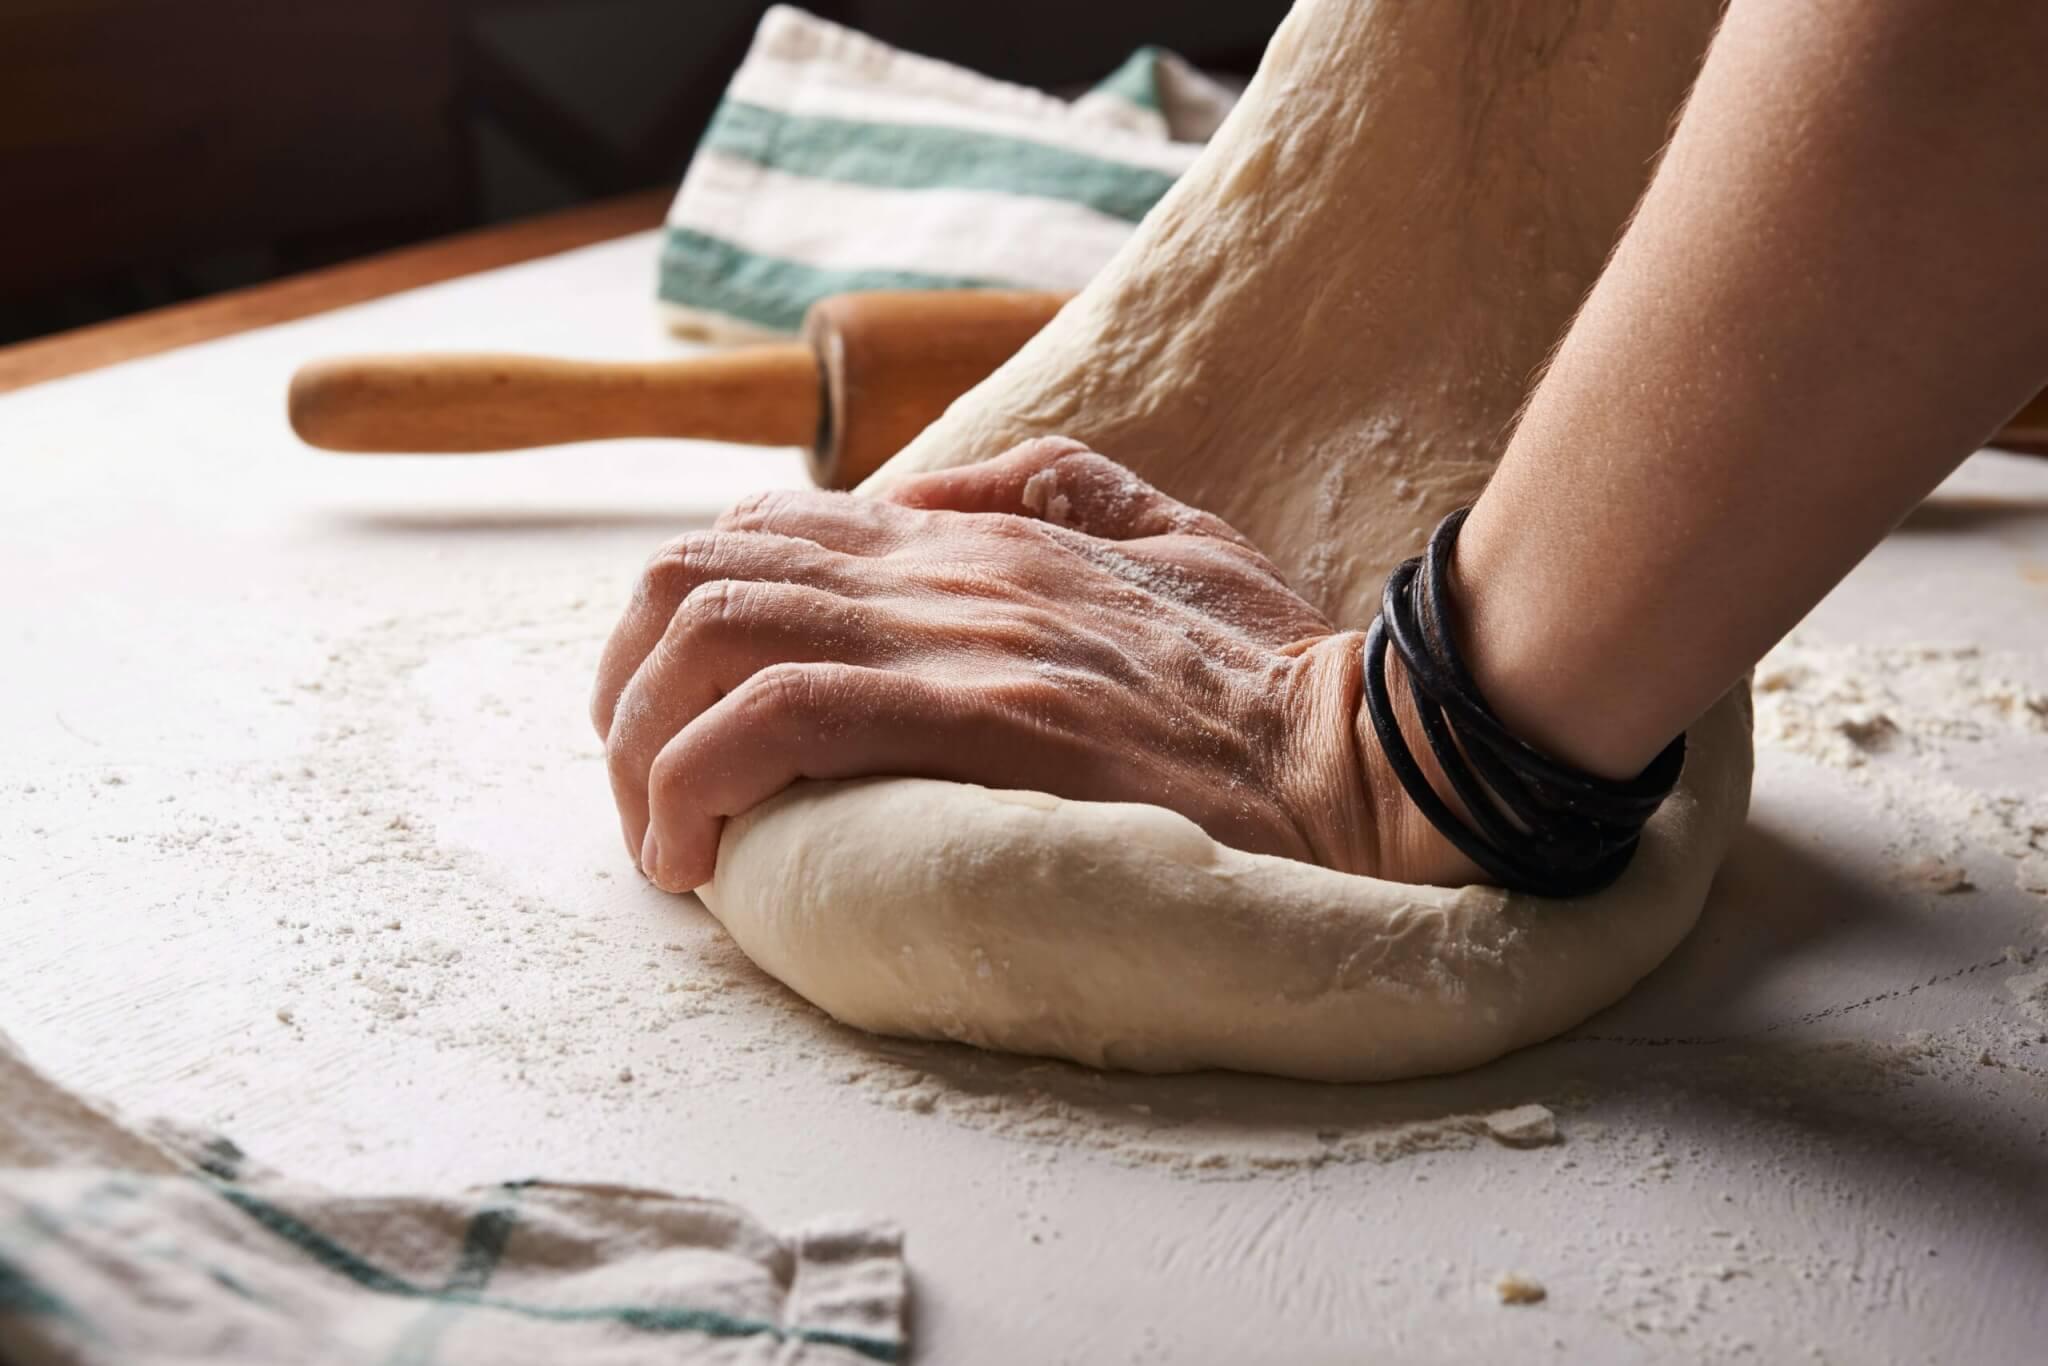 Wilde Wortels - Blog brood gezond of niet gezond - Foto via Unsplash Nadya Spetnitskaya